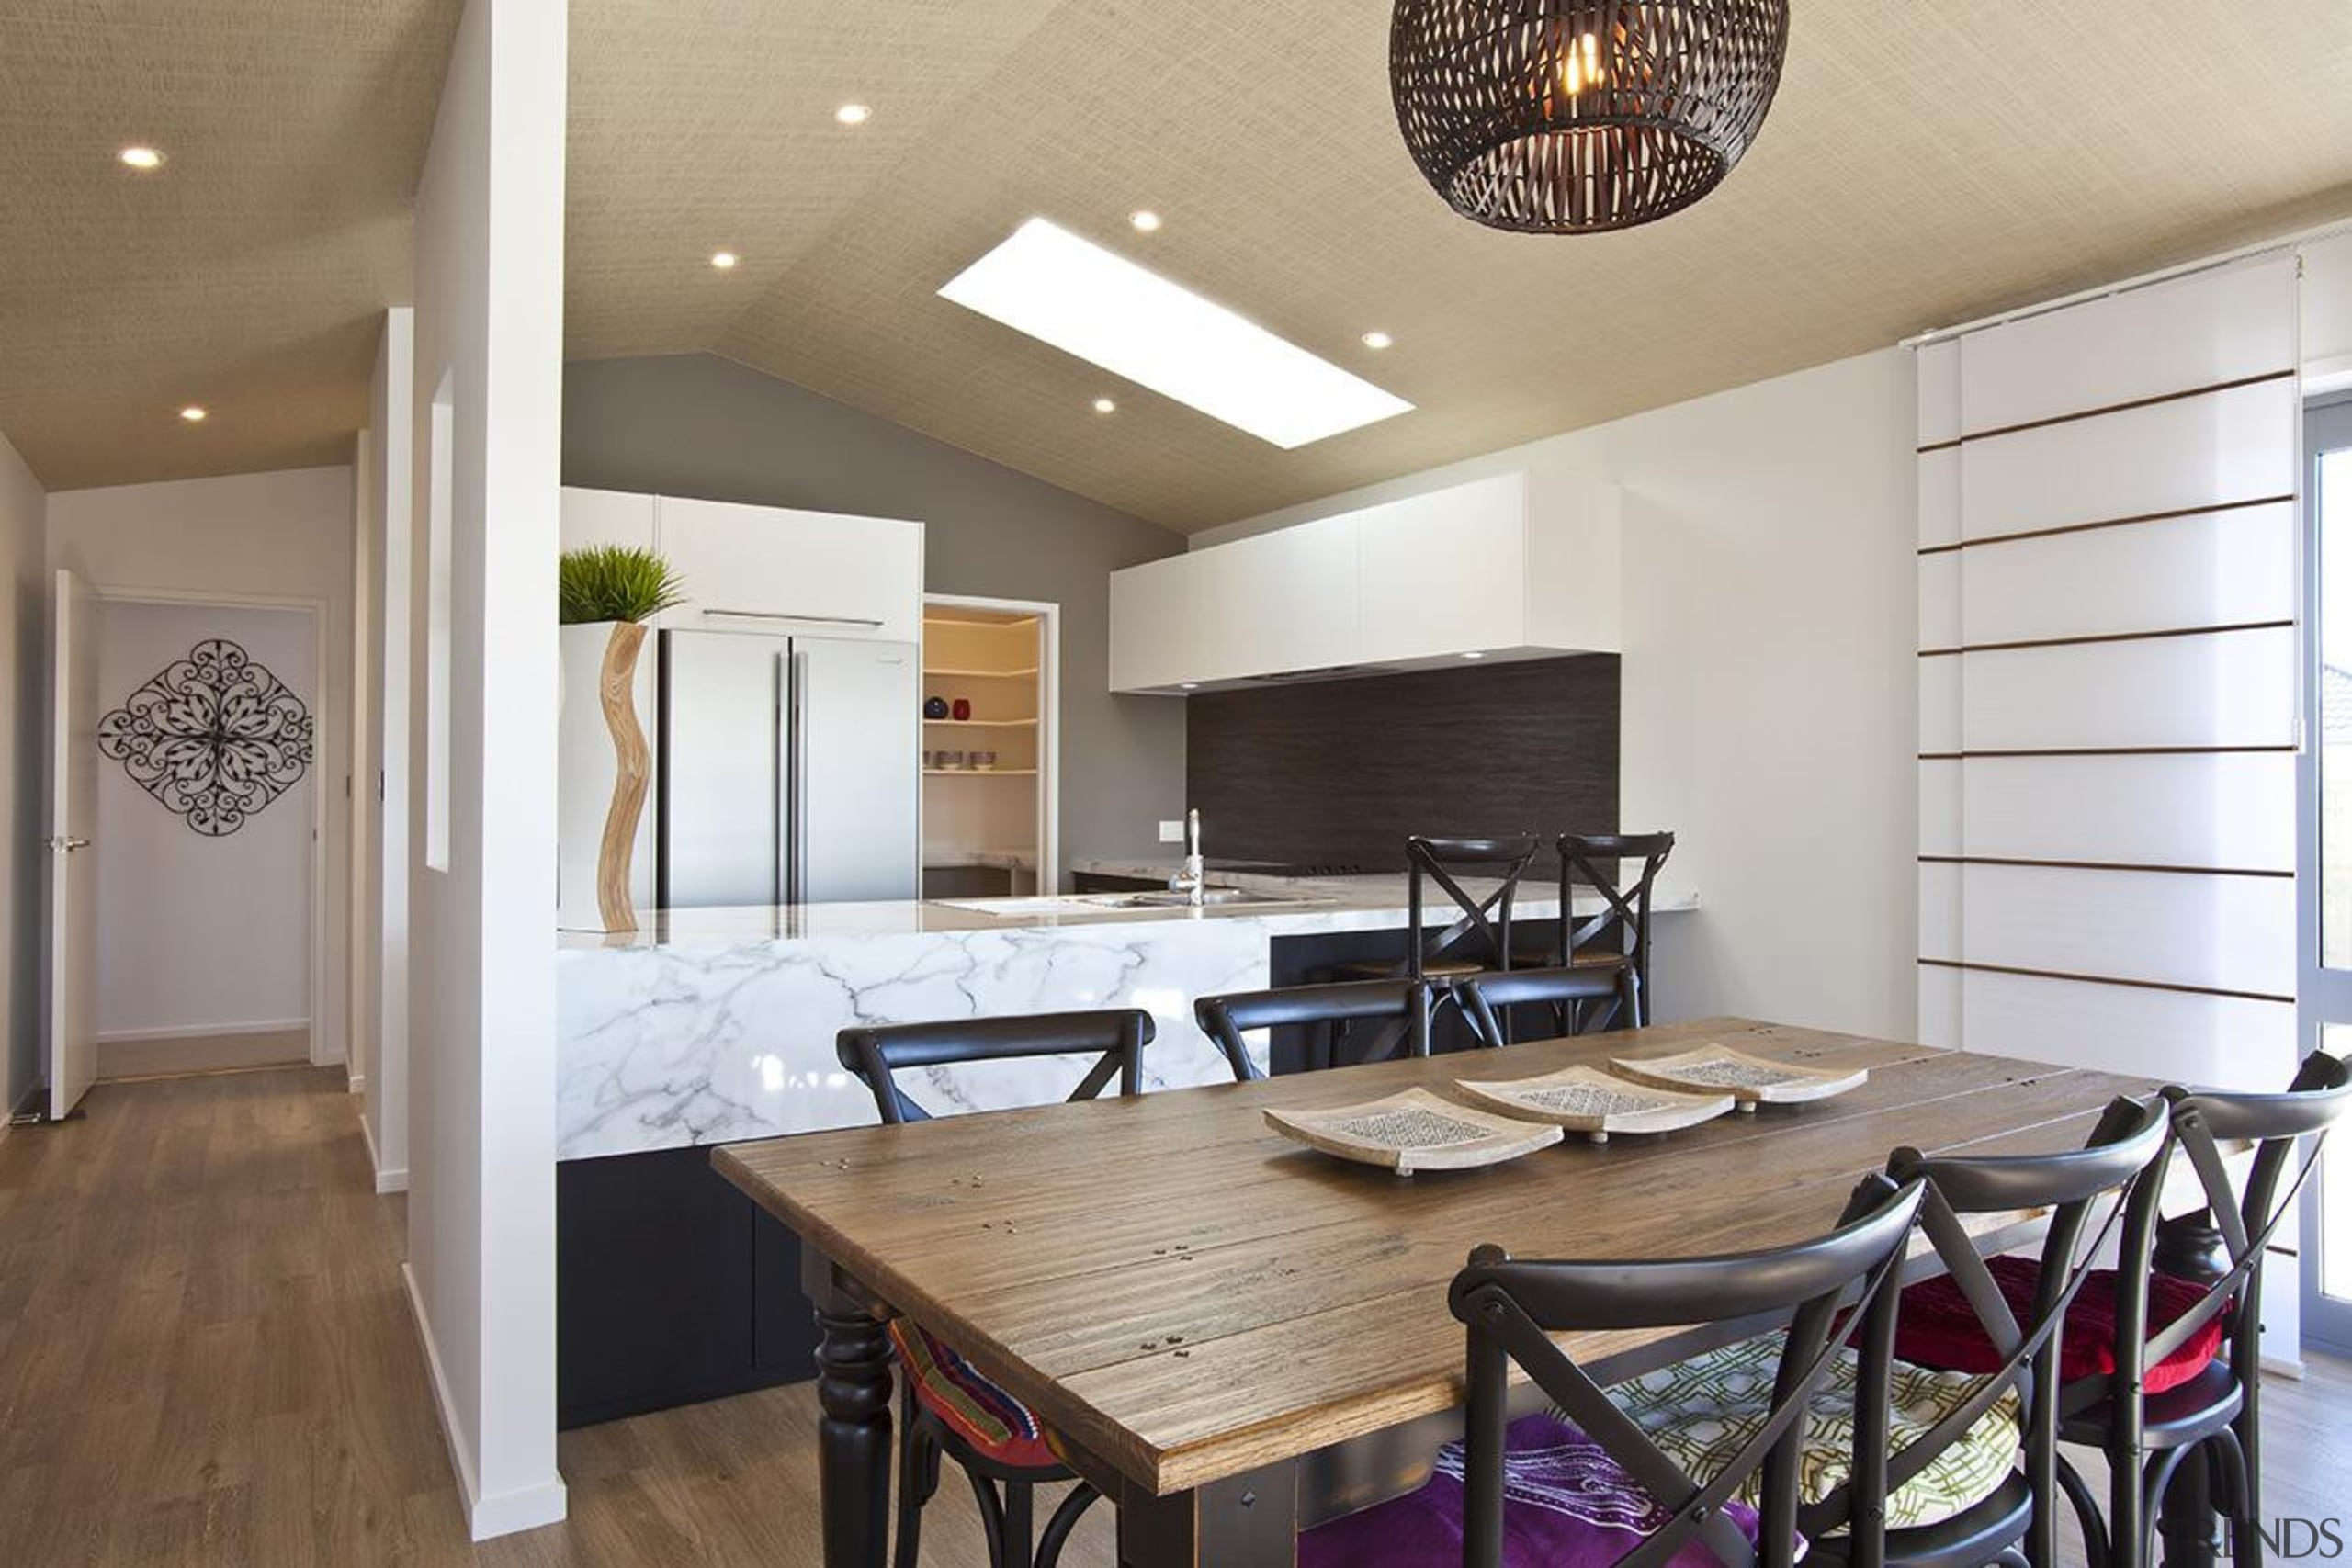 For more information, please visit www.gjgardner.co.nz ceiling, dining room, interior design, real estate, table, gray